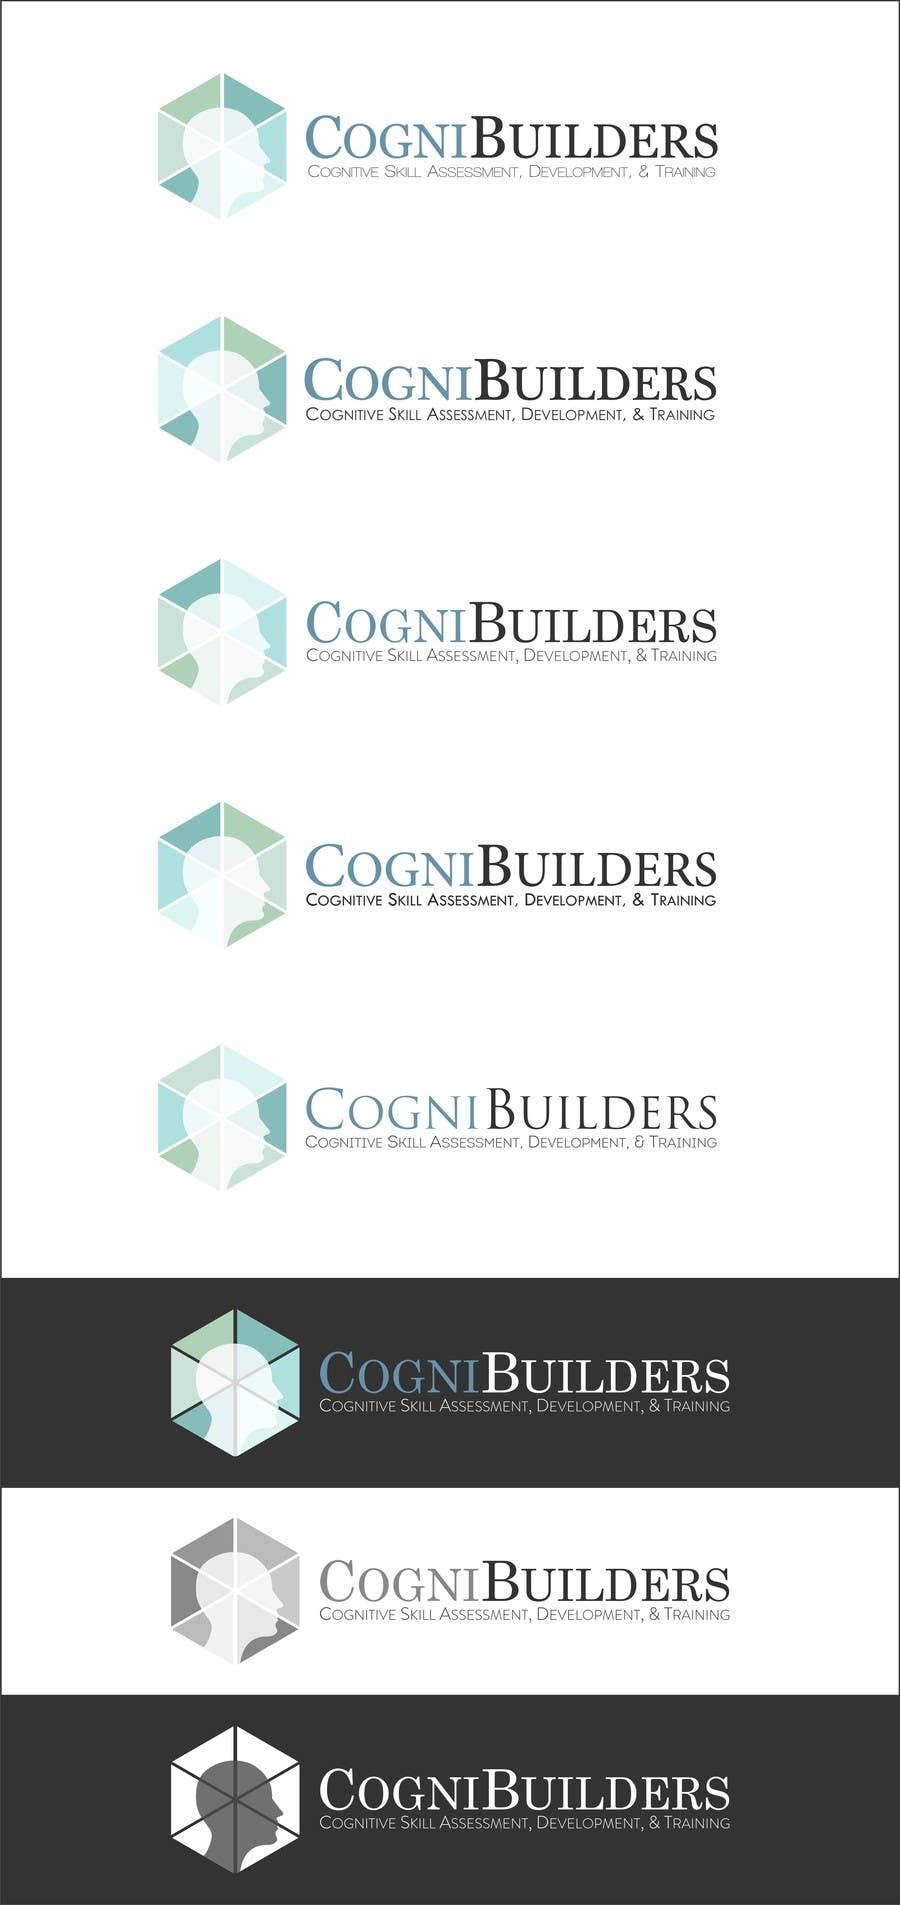 Penyertaan Peraduan #                                        85                                      untuk                                         Design a Logo for Cognibuilders